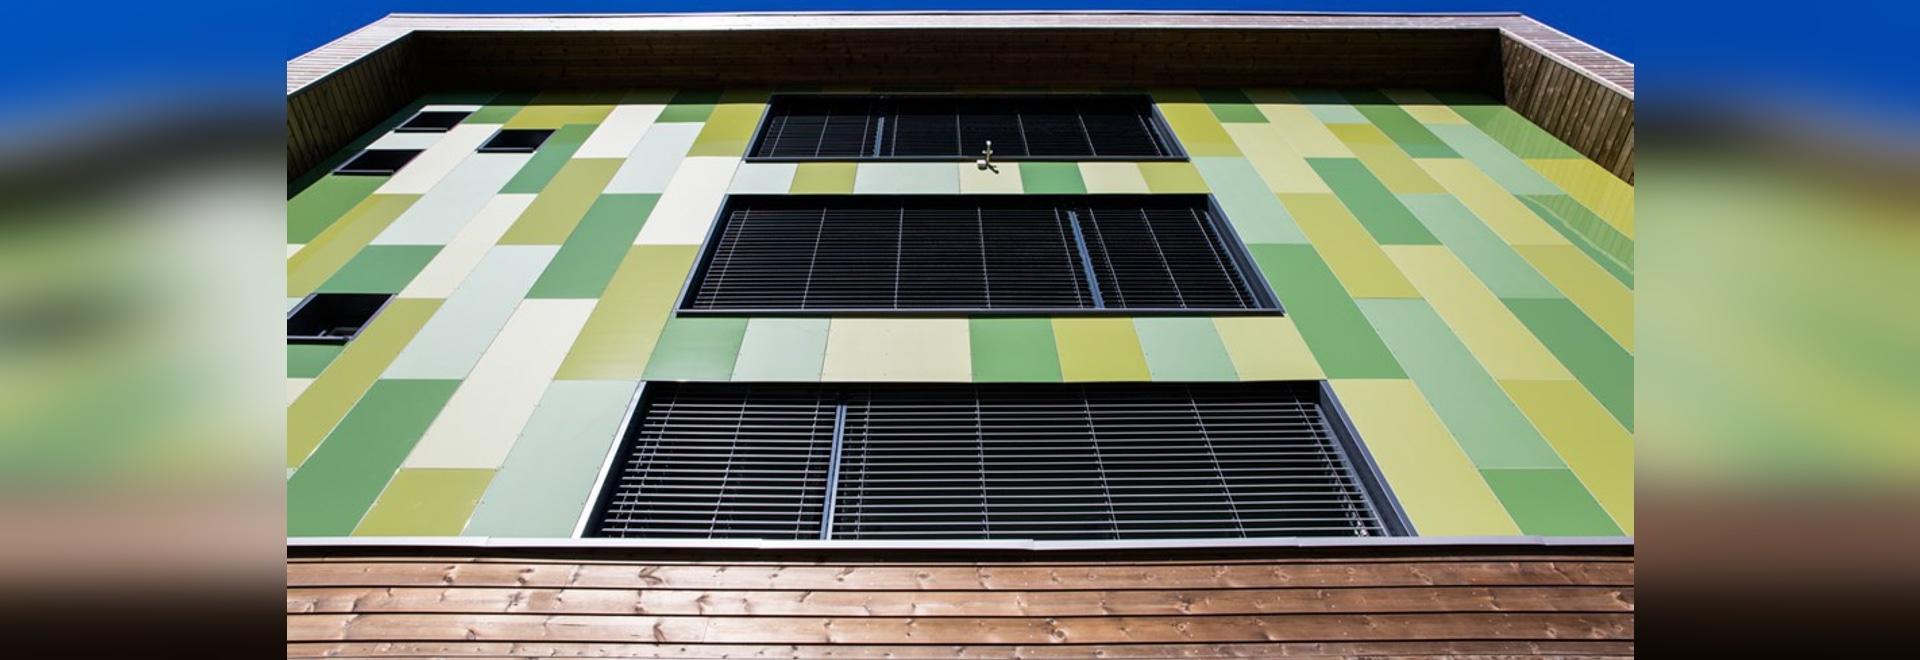 Remmen student accommodation